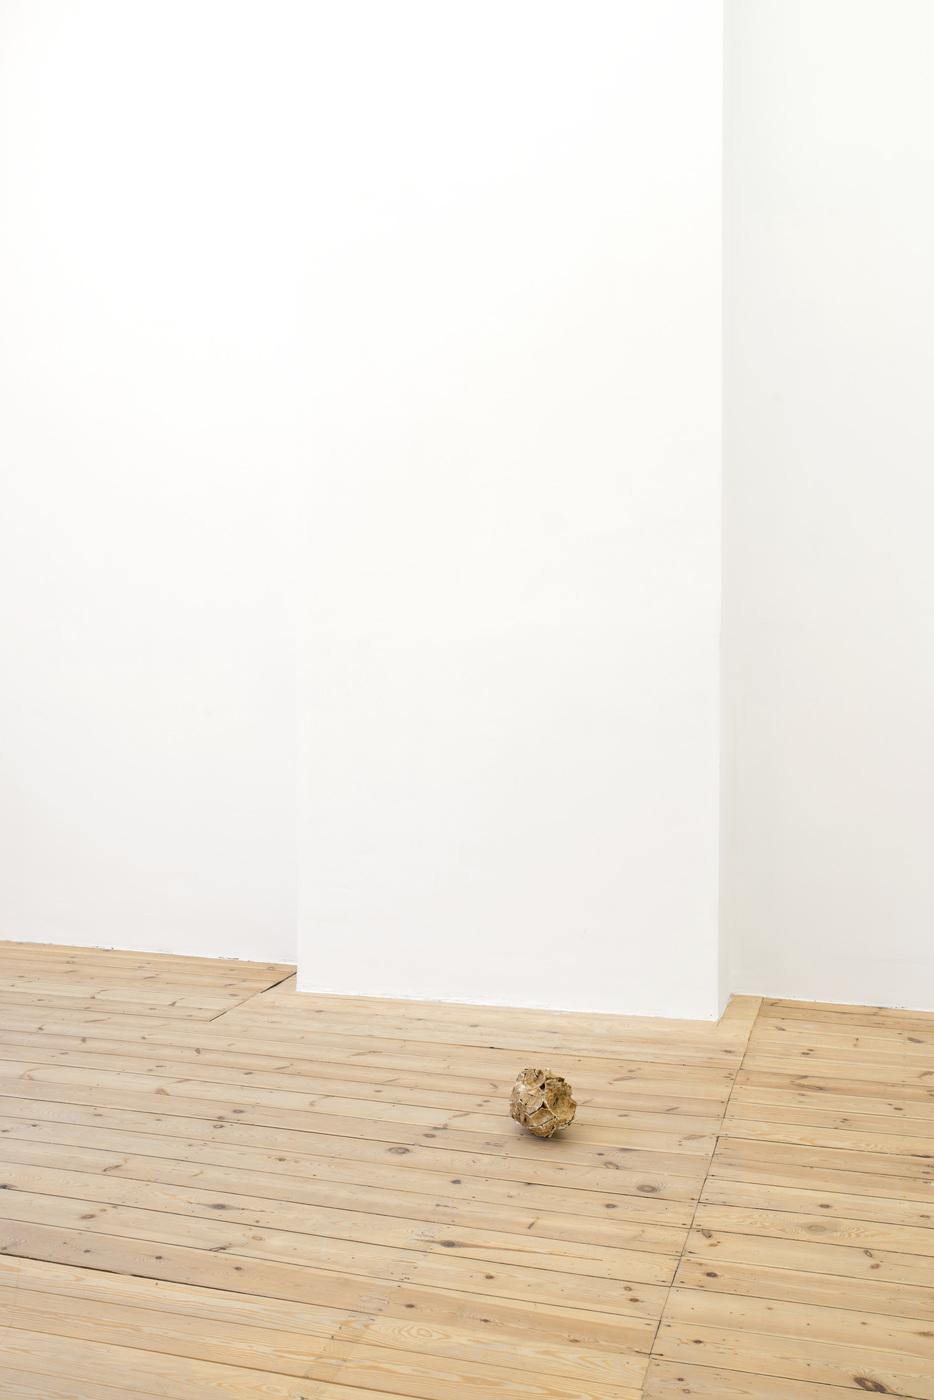 Ariel Schlesinger, Untitled (Inside Out Skull), 2014 (7)